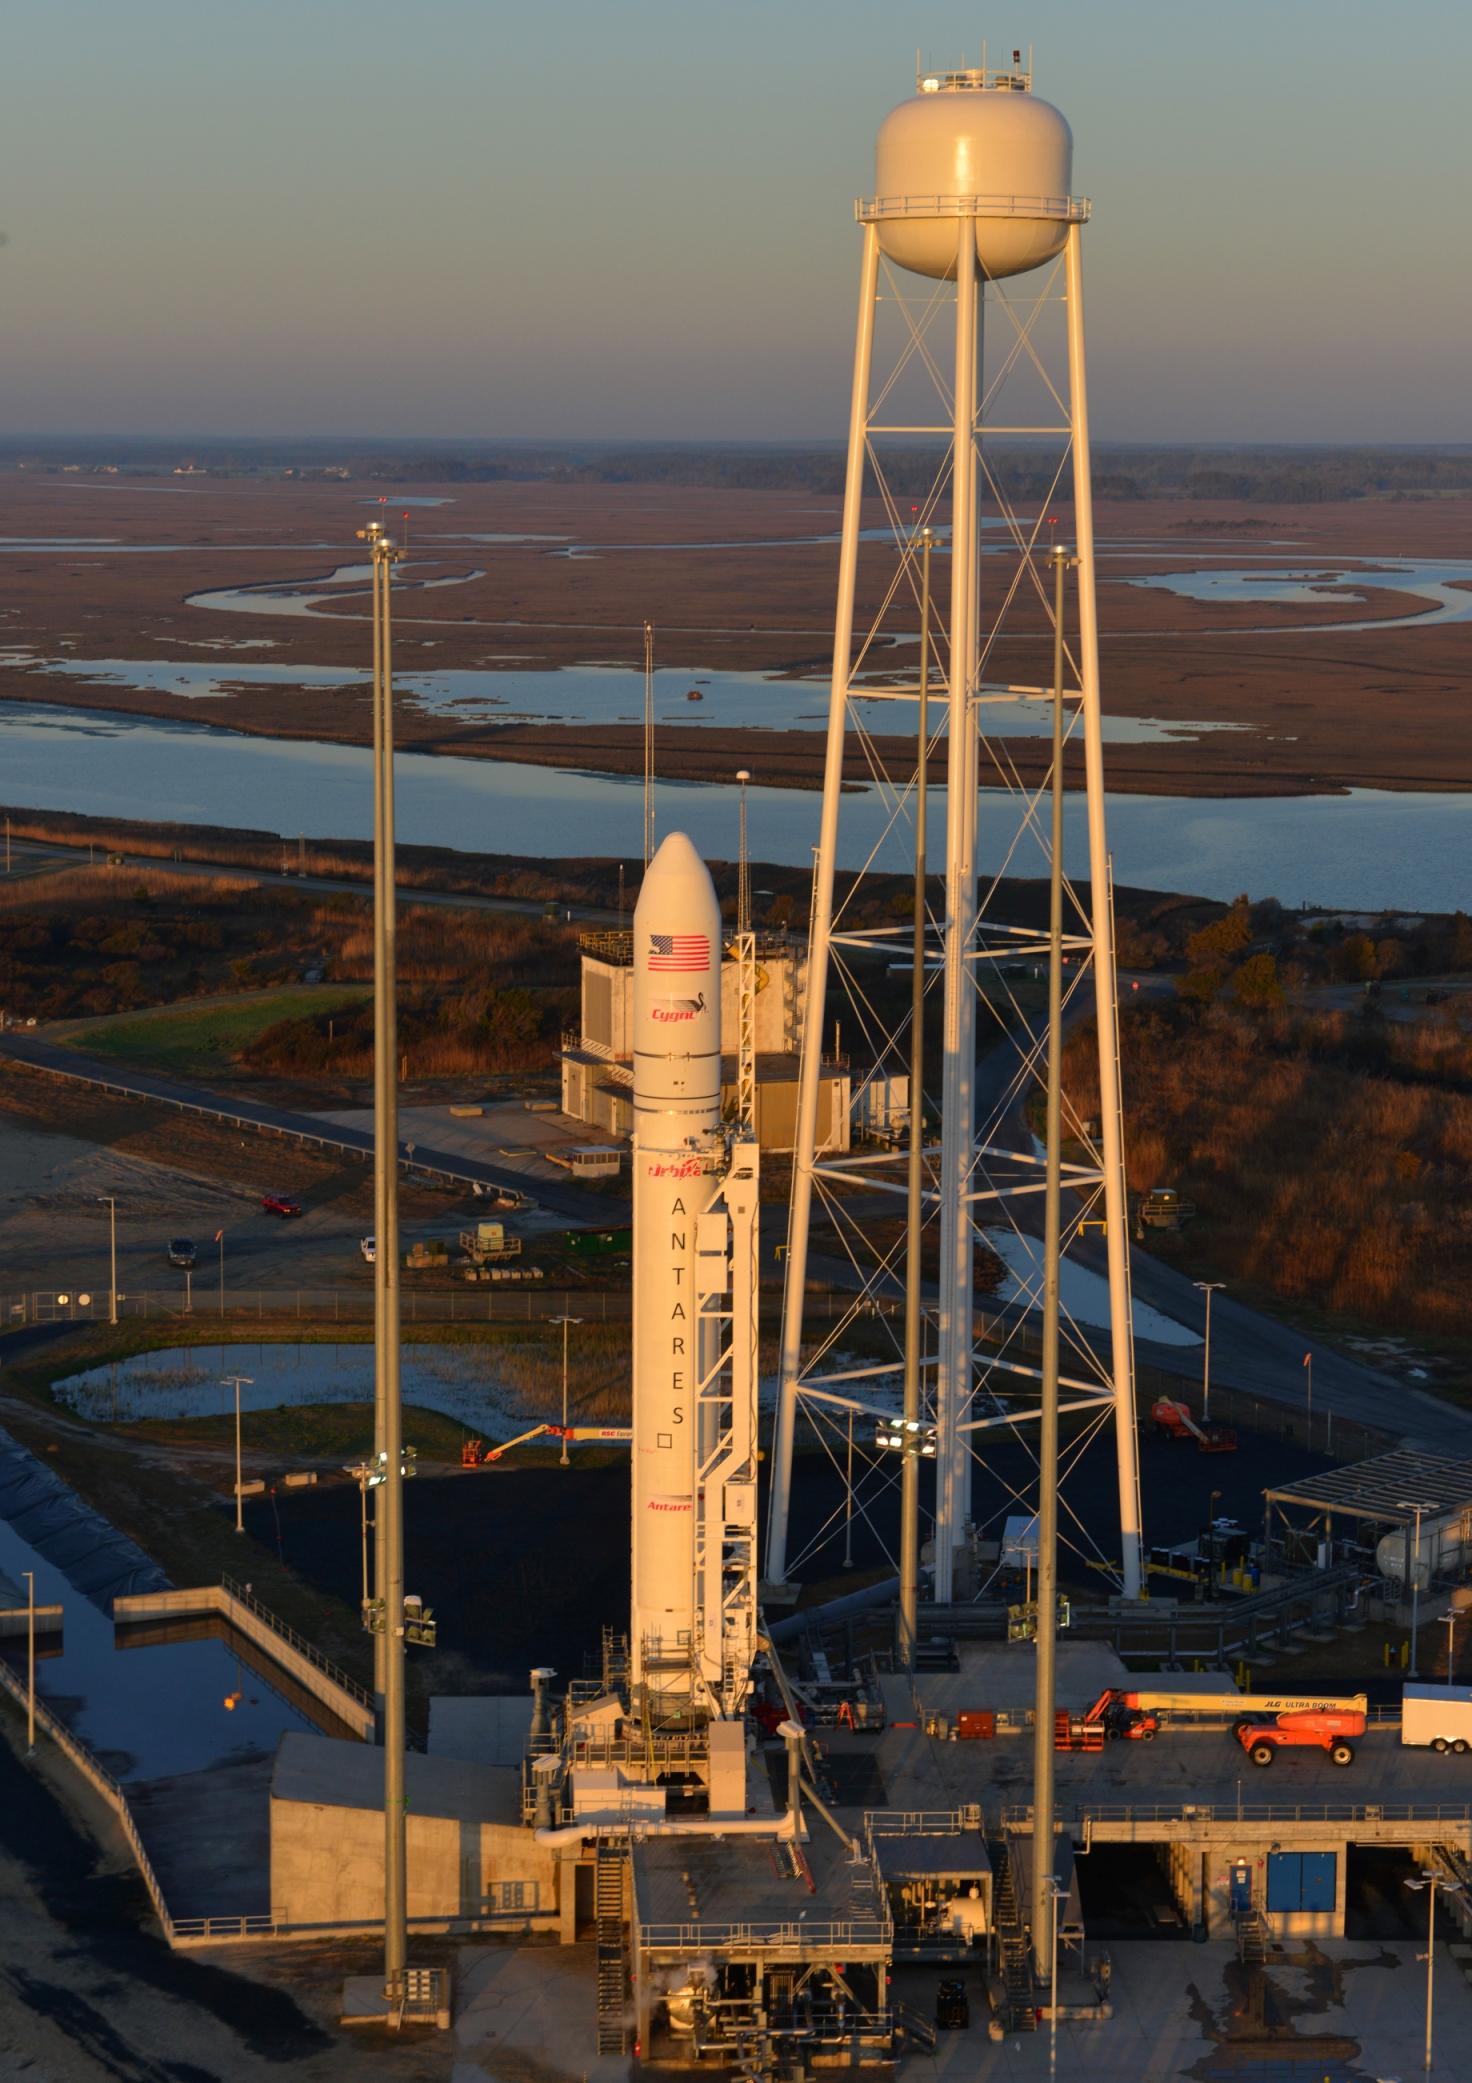 The Antares rocket on the pad at MARS.